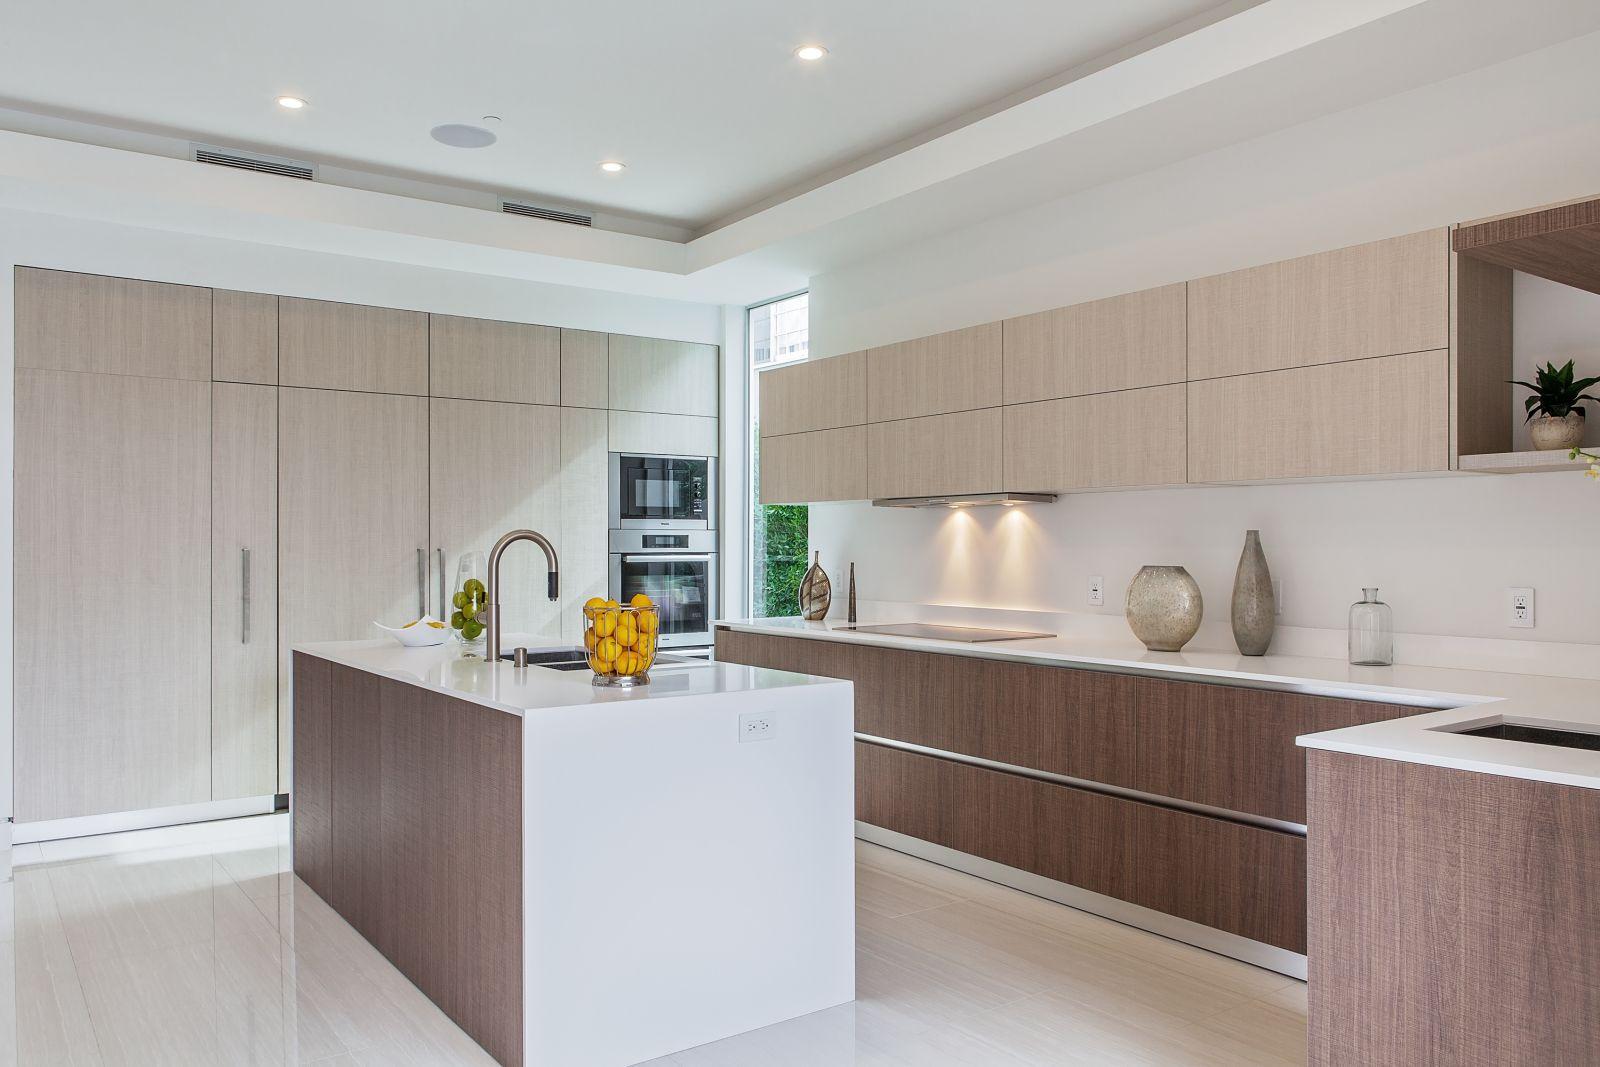 Kitchen Cabinets Modern Iatlian